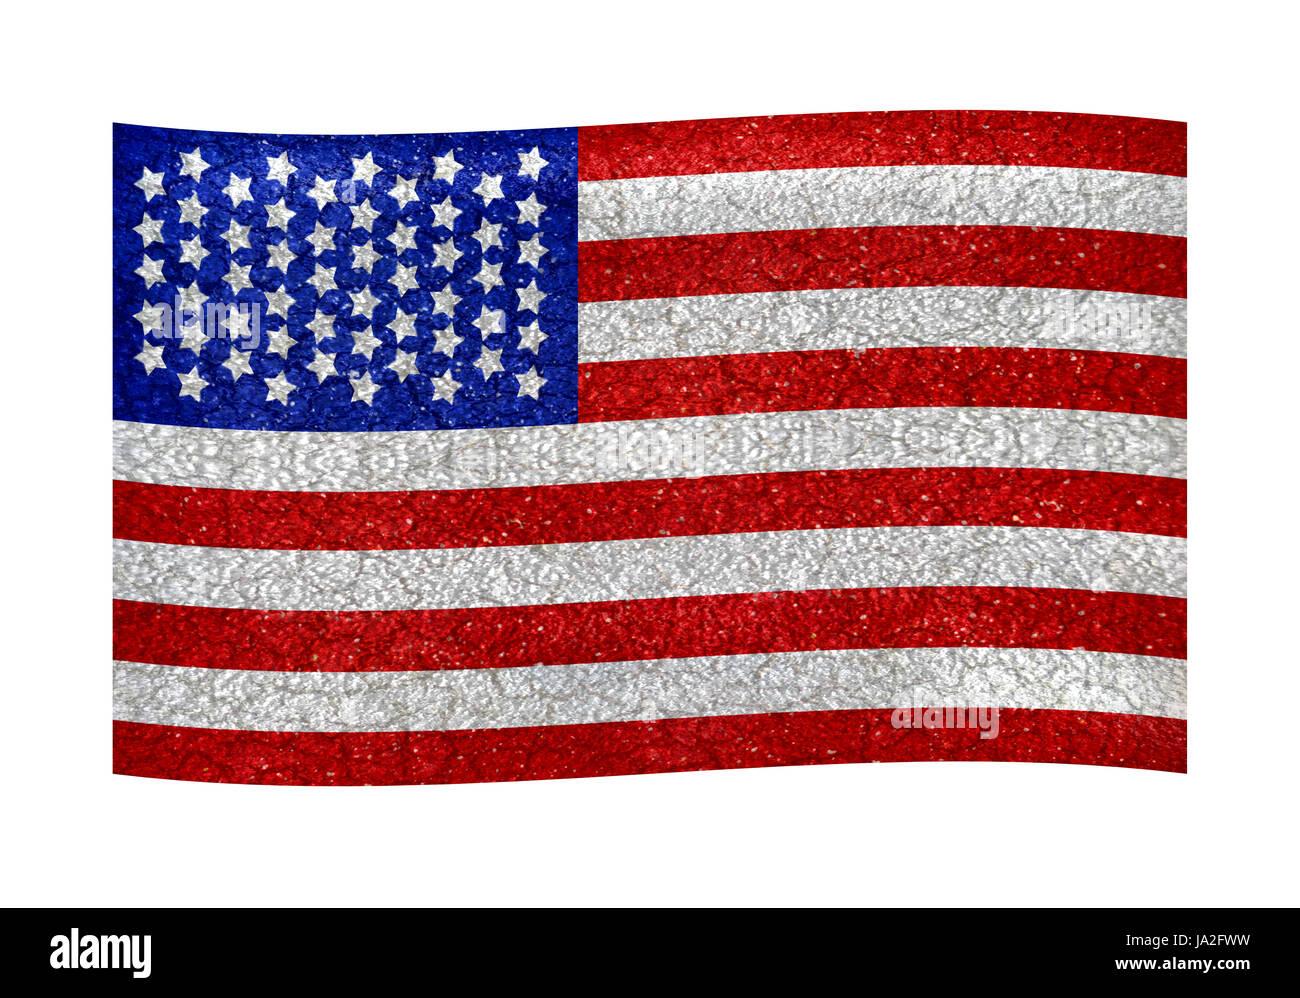 185f1cb4b60242 American Celebration Vintage Stock Photos   American Celebration ...